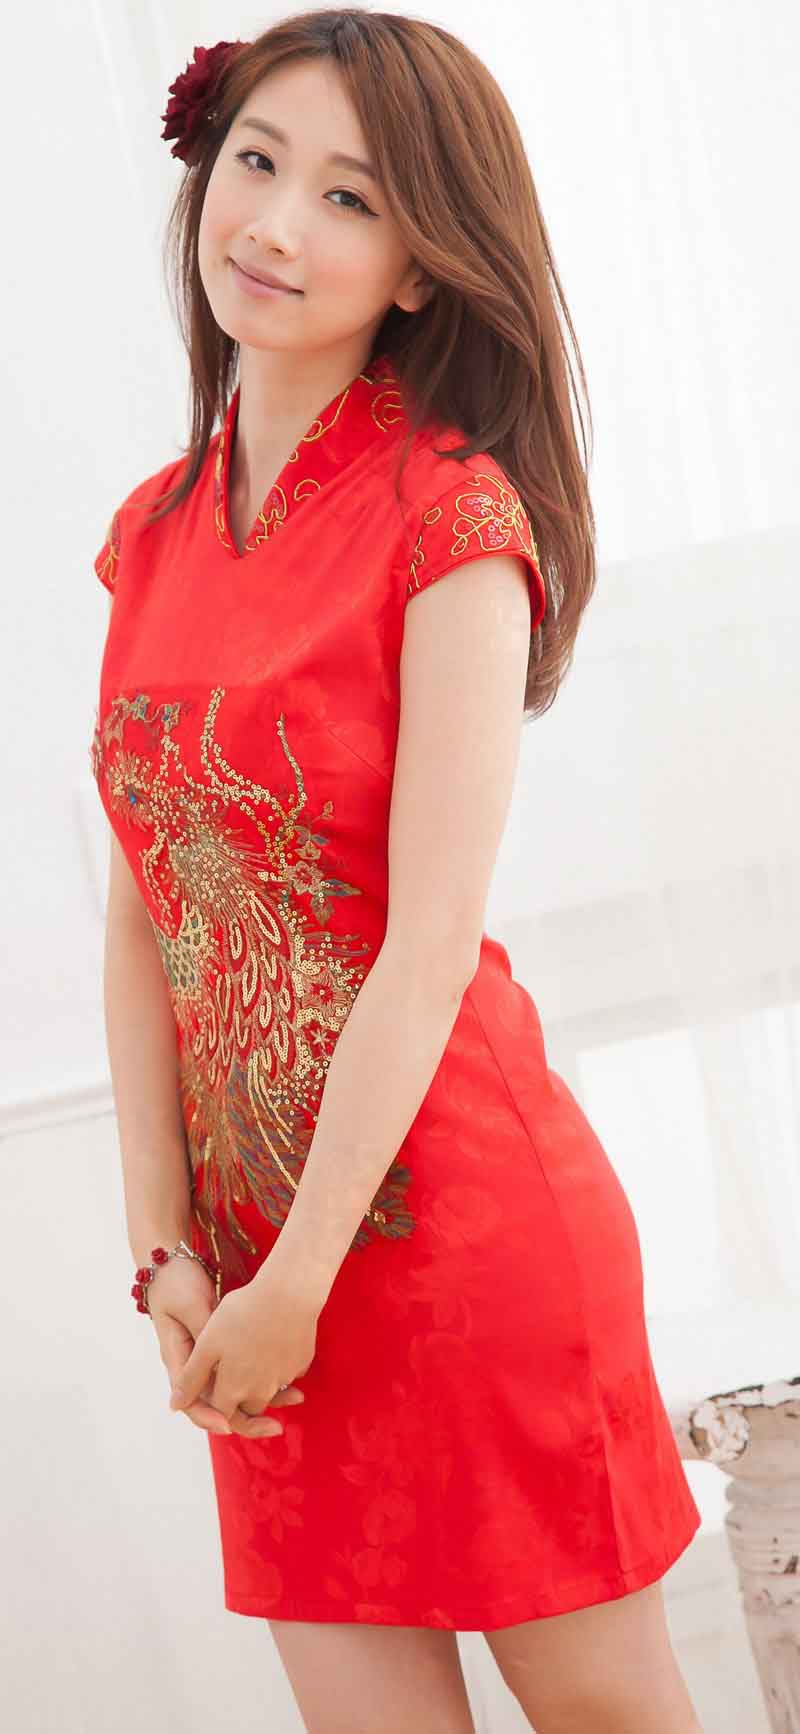 BAJU DRESS CHEONGSAM WANITA IMLEK 2014 MURAH